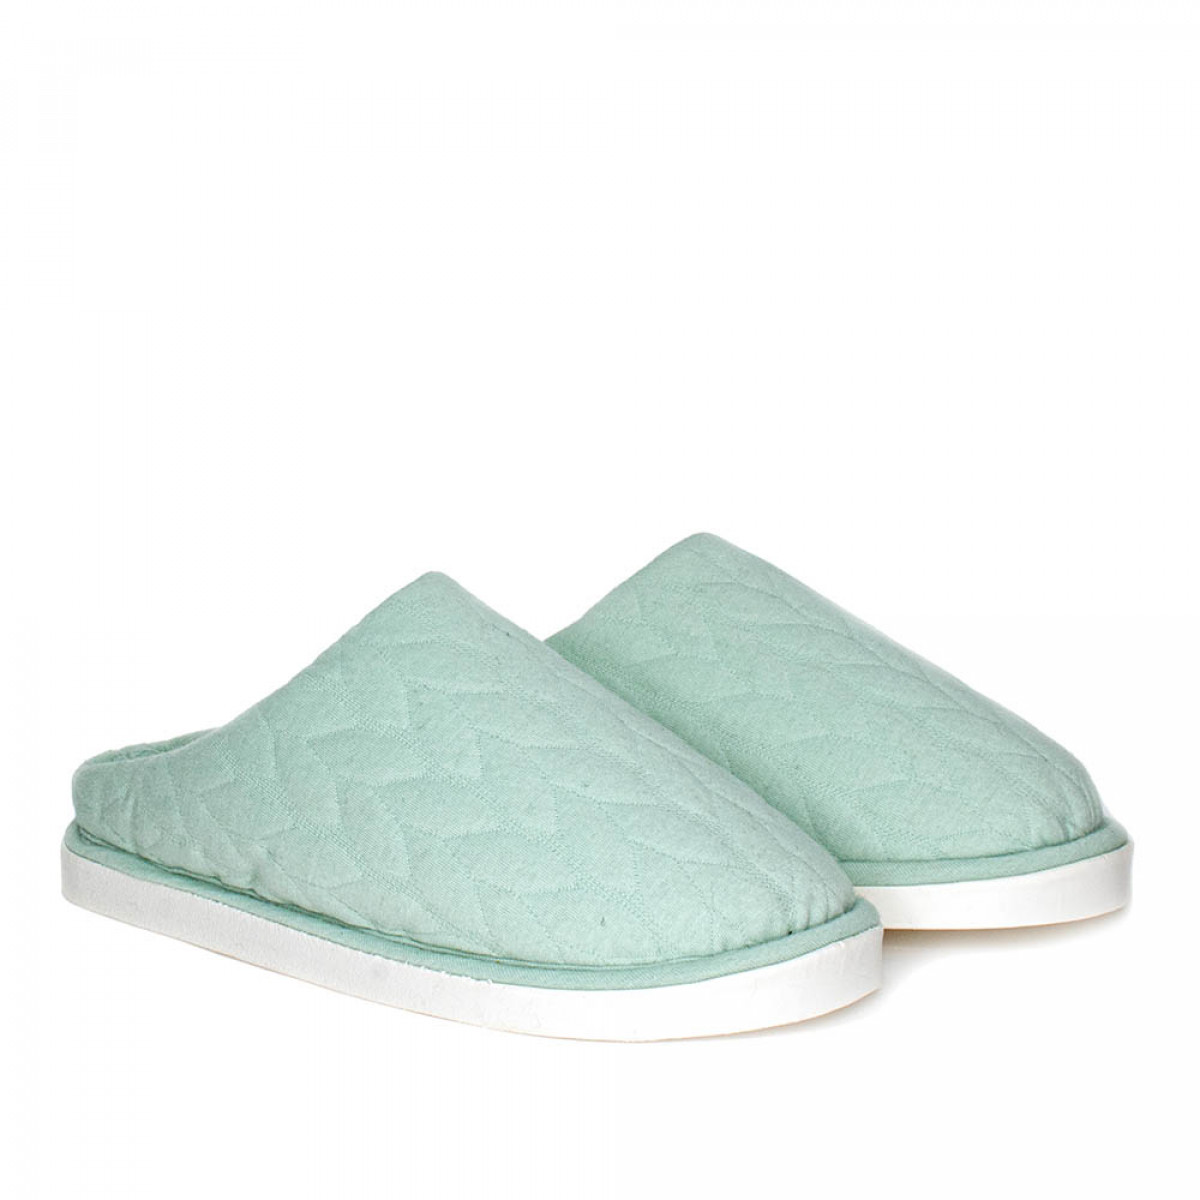 Women's Home slippers FAMILY, Mint